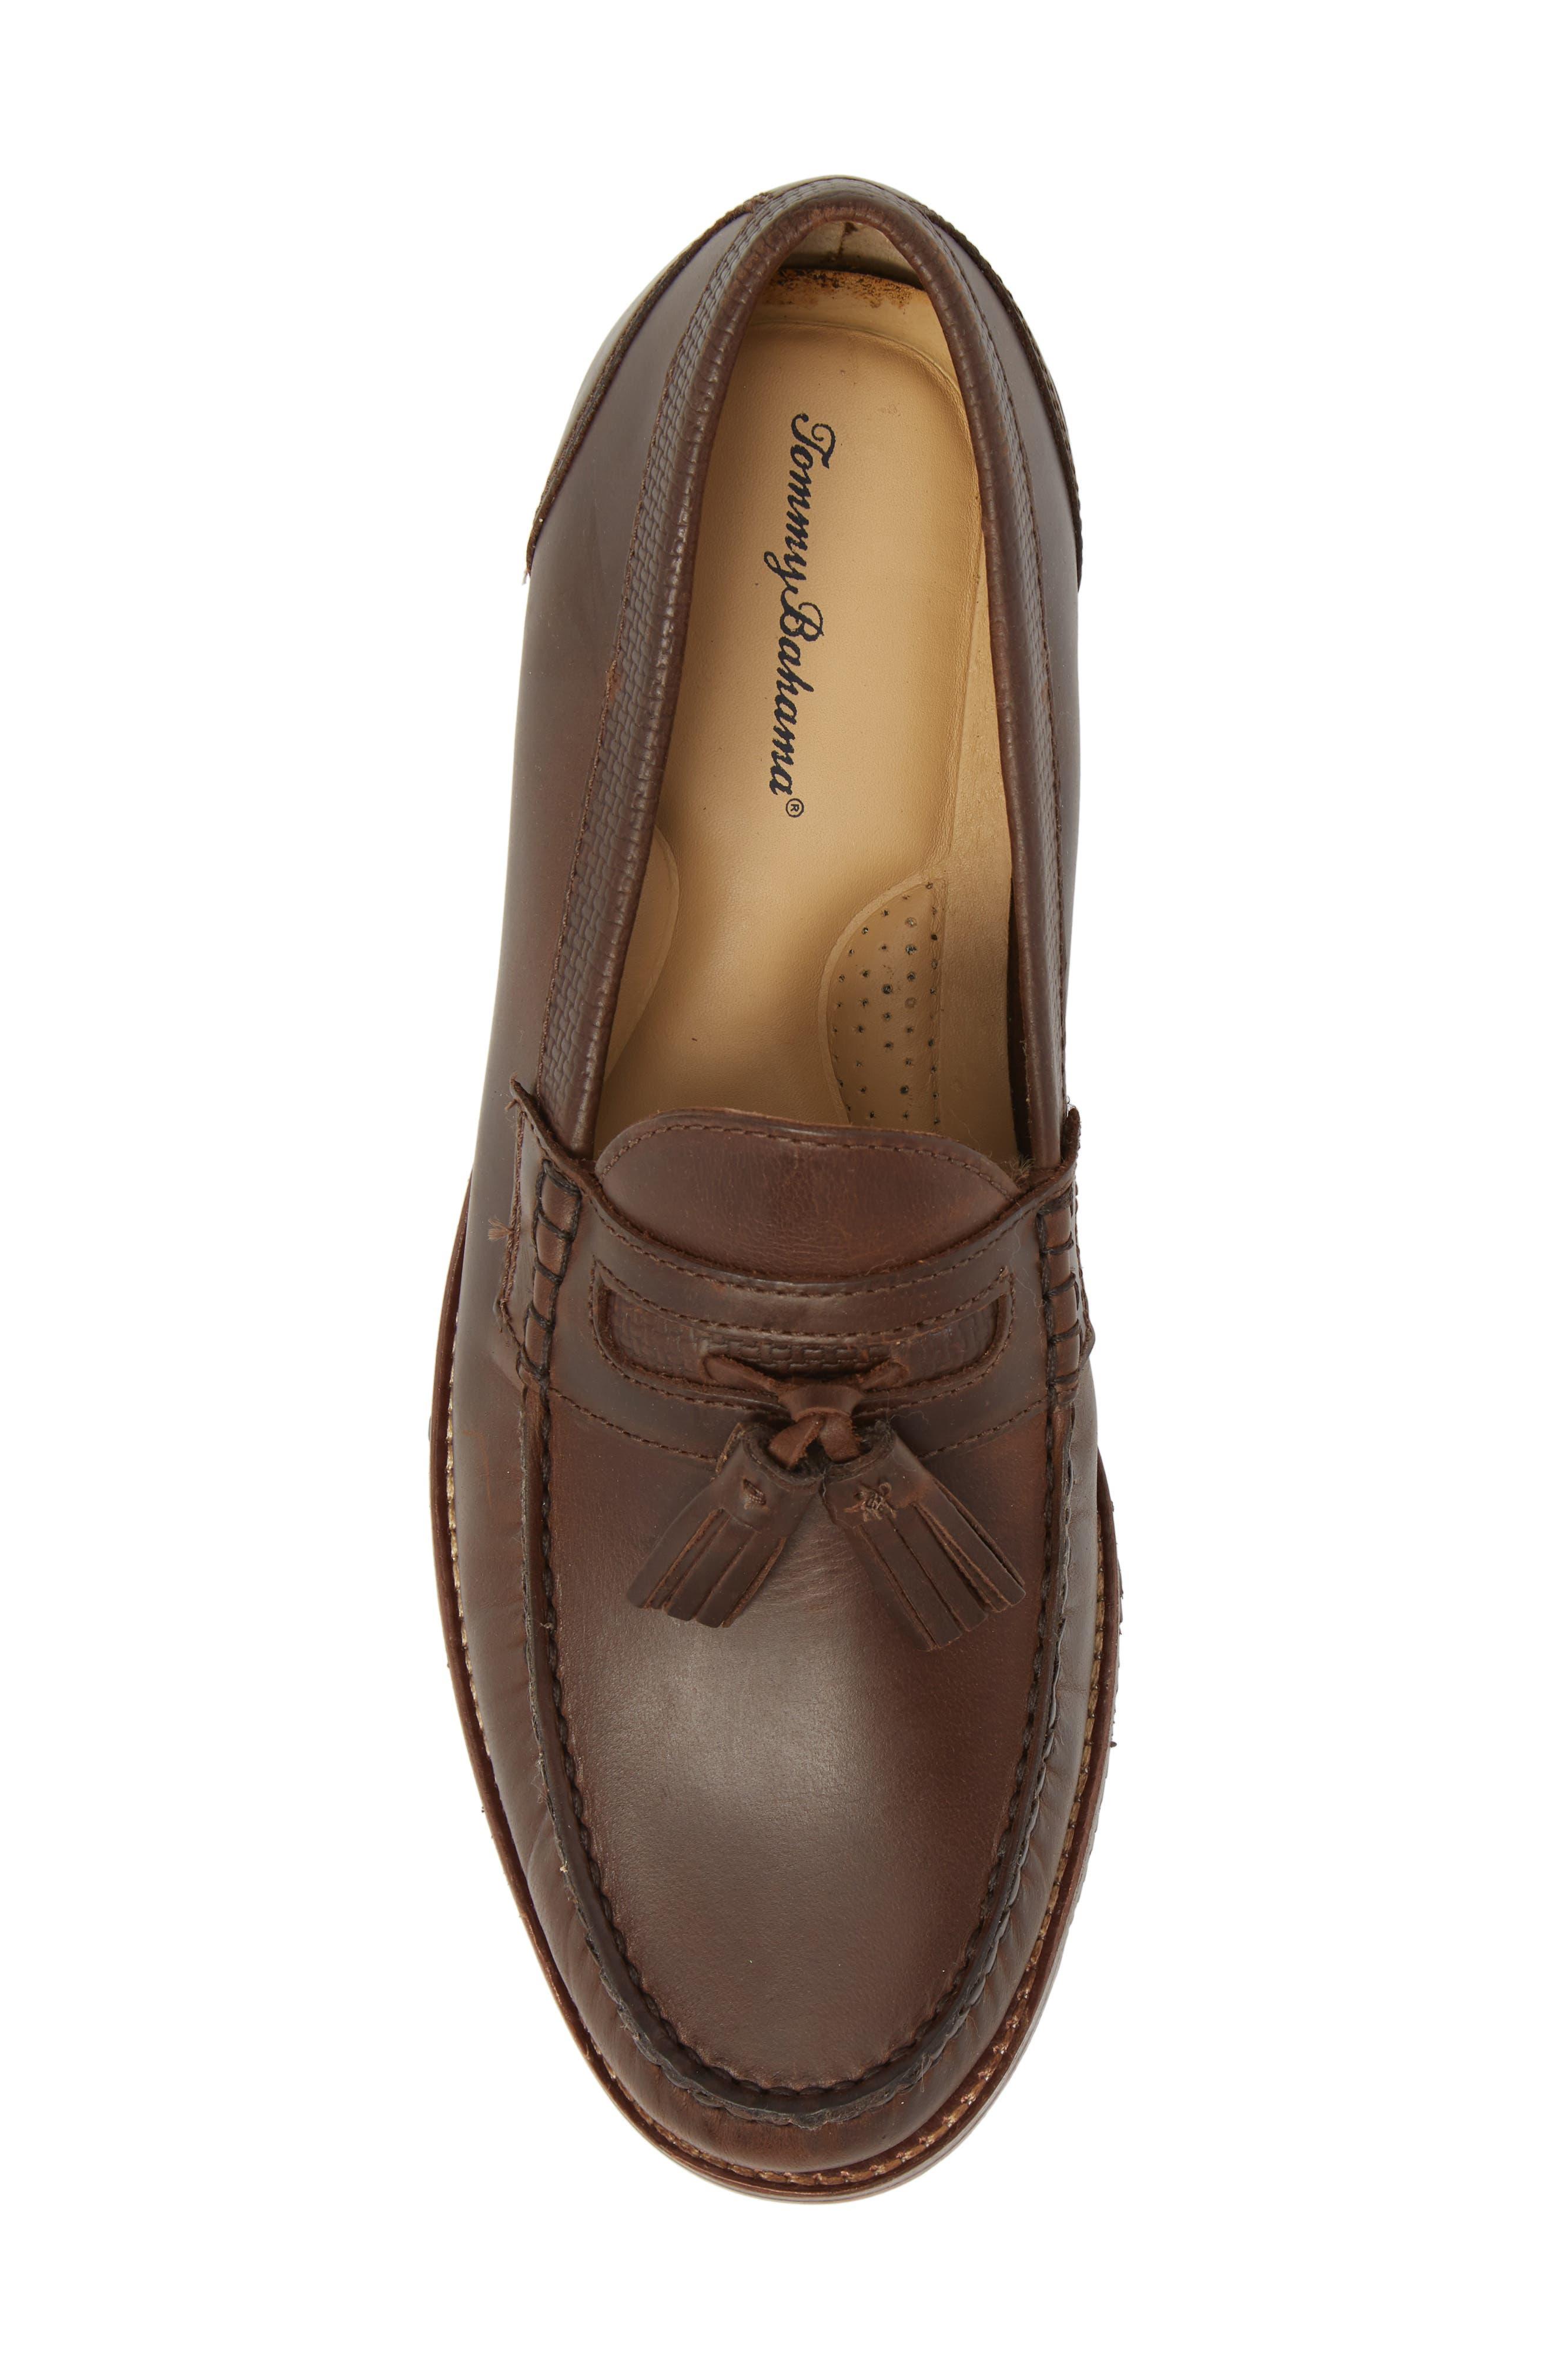 Tasslington Loafer,                             Alternate thumbnail 3, color,                             Dark Brown Leather